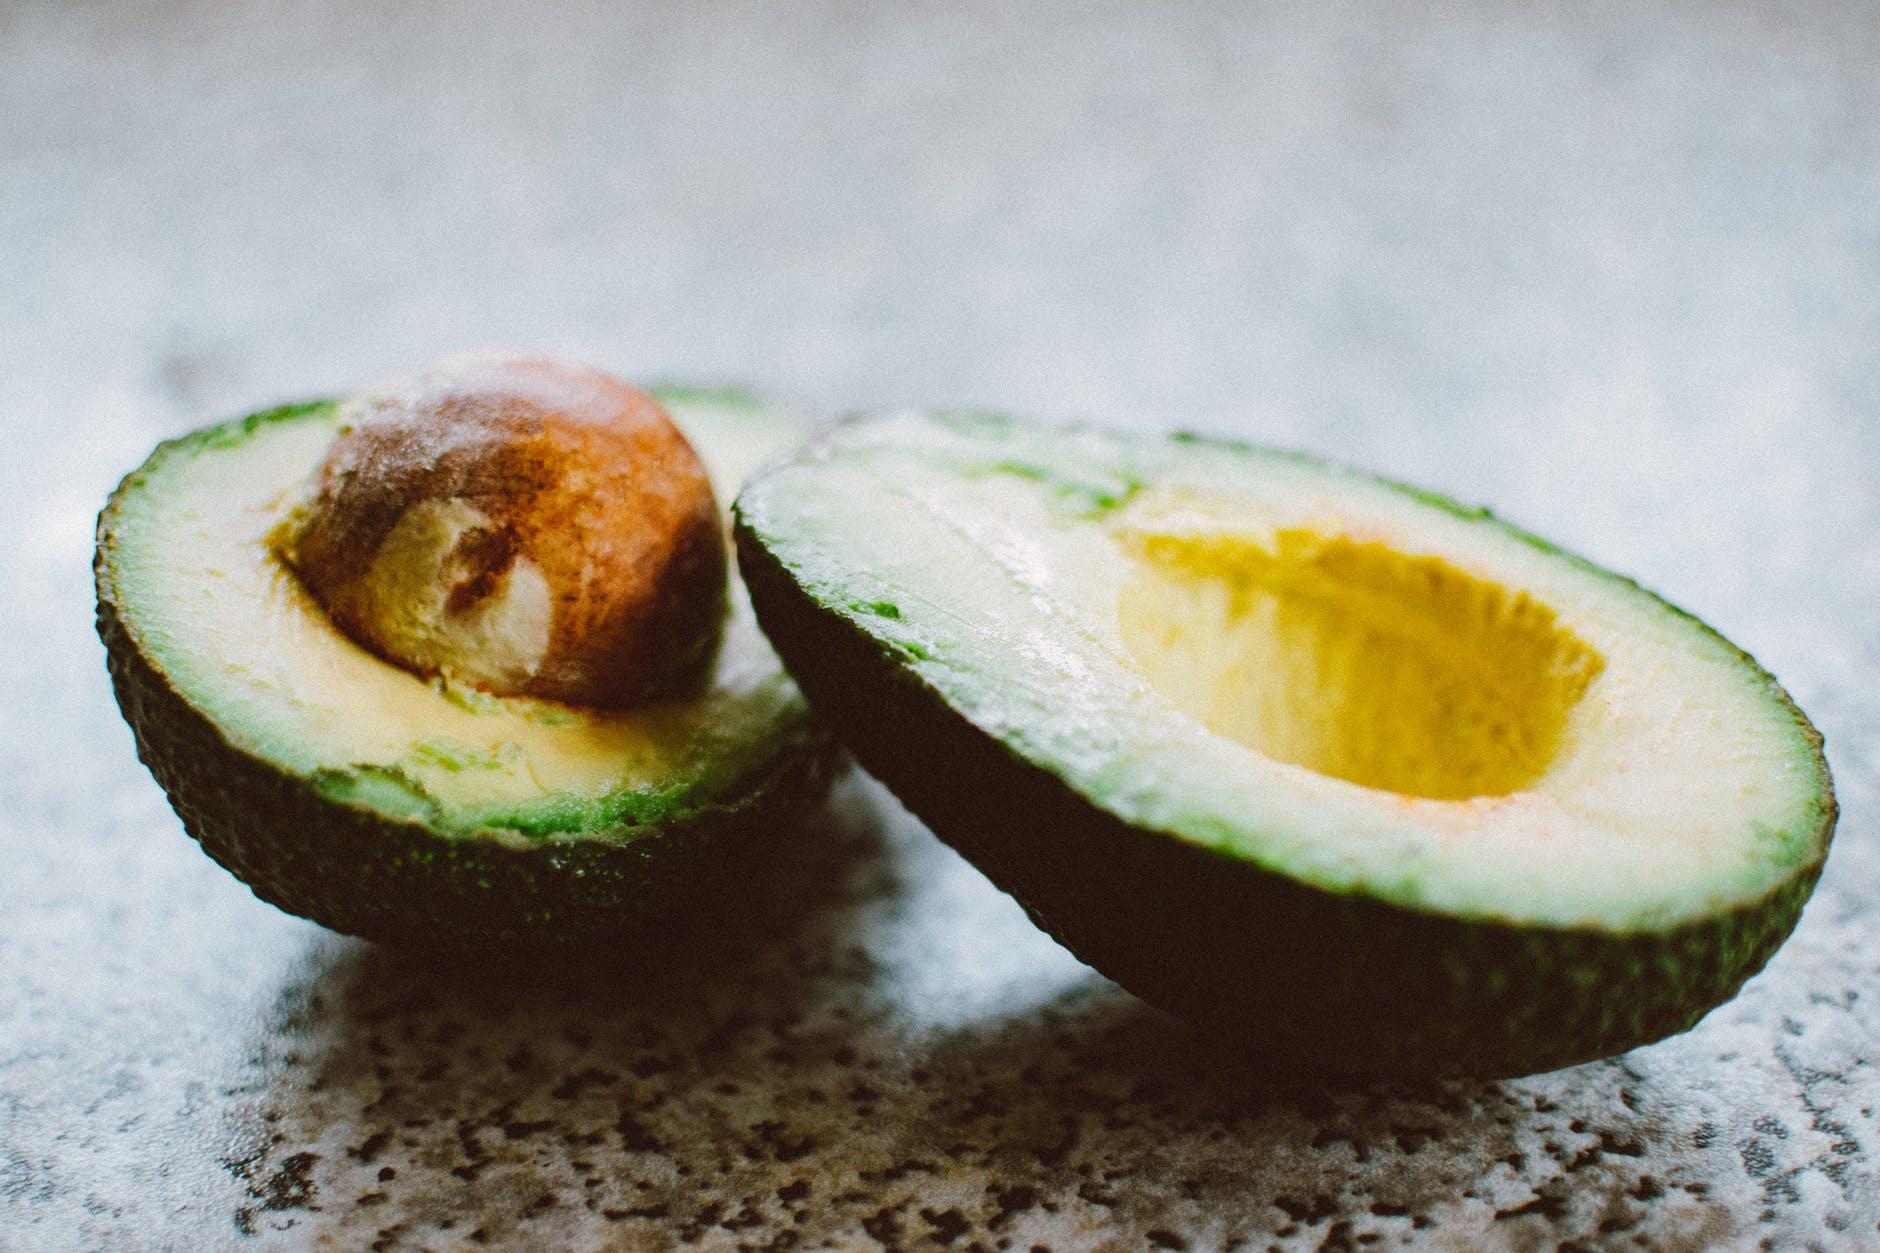 Avocado cut in half on a counter